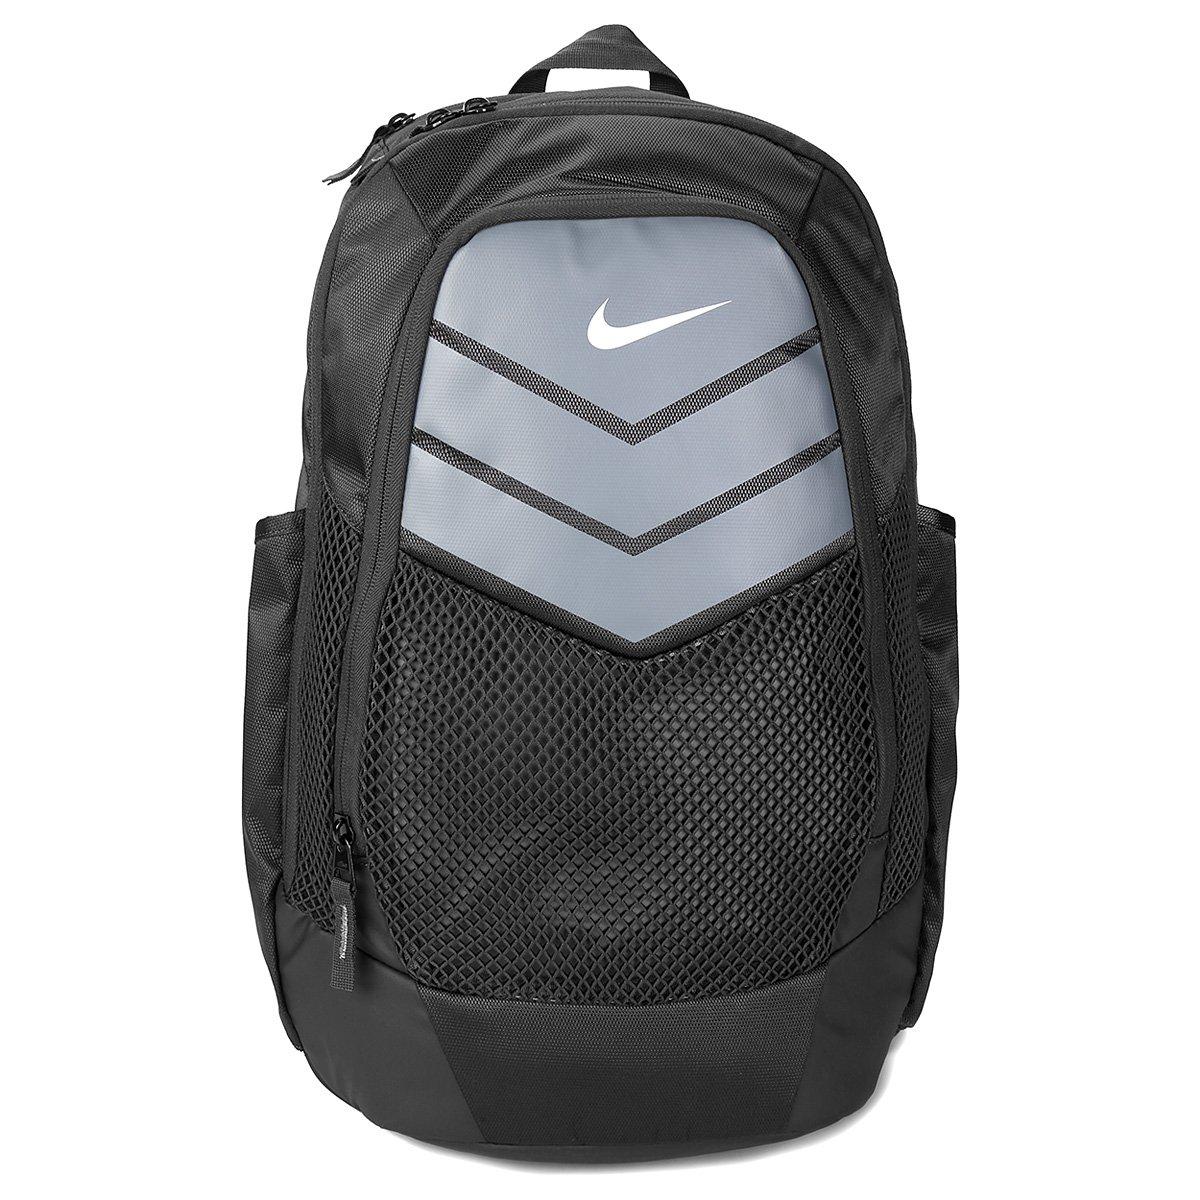 0a325bc8f6c41 Mochila Nike Vapor Power Backpack Masculina - Compre Agora